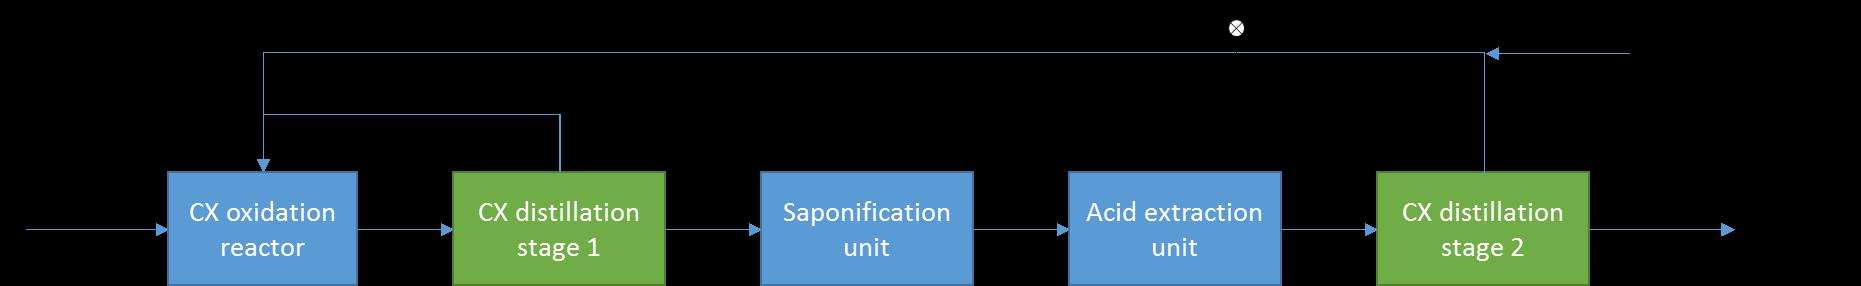 Figure 1: Simplified Process Flow Scheme